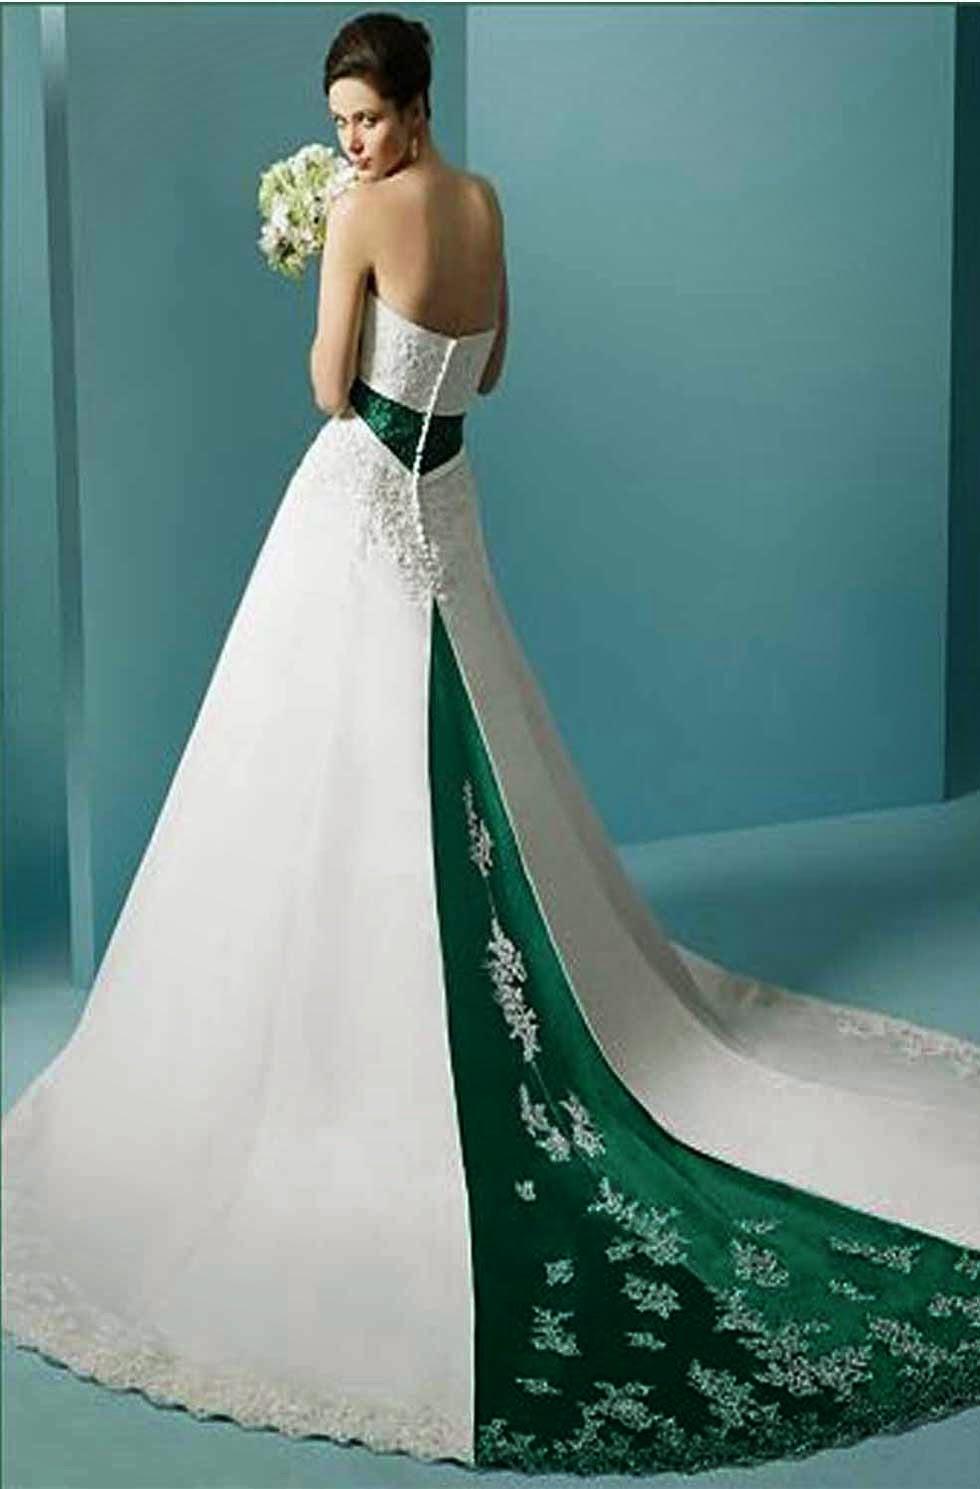 Colored Lace Wedding Dresses Photos HD Concepts Ideas